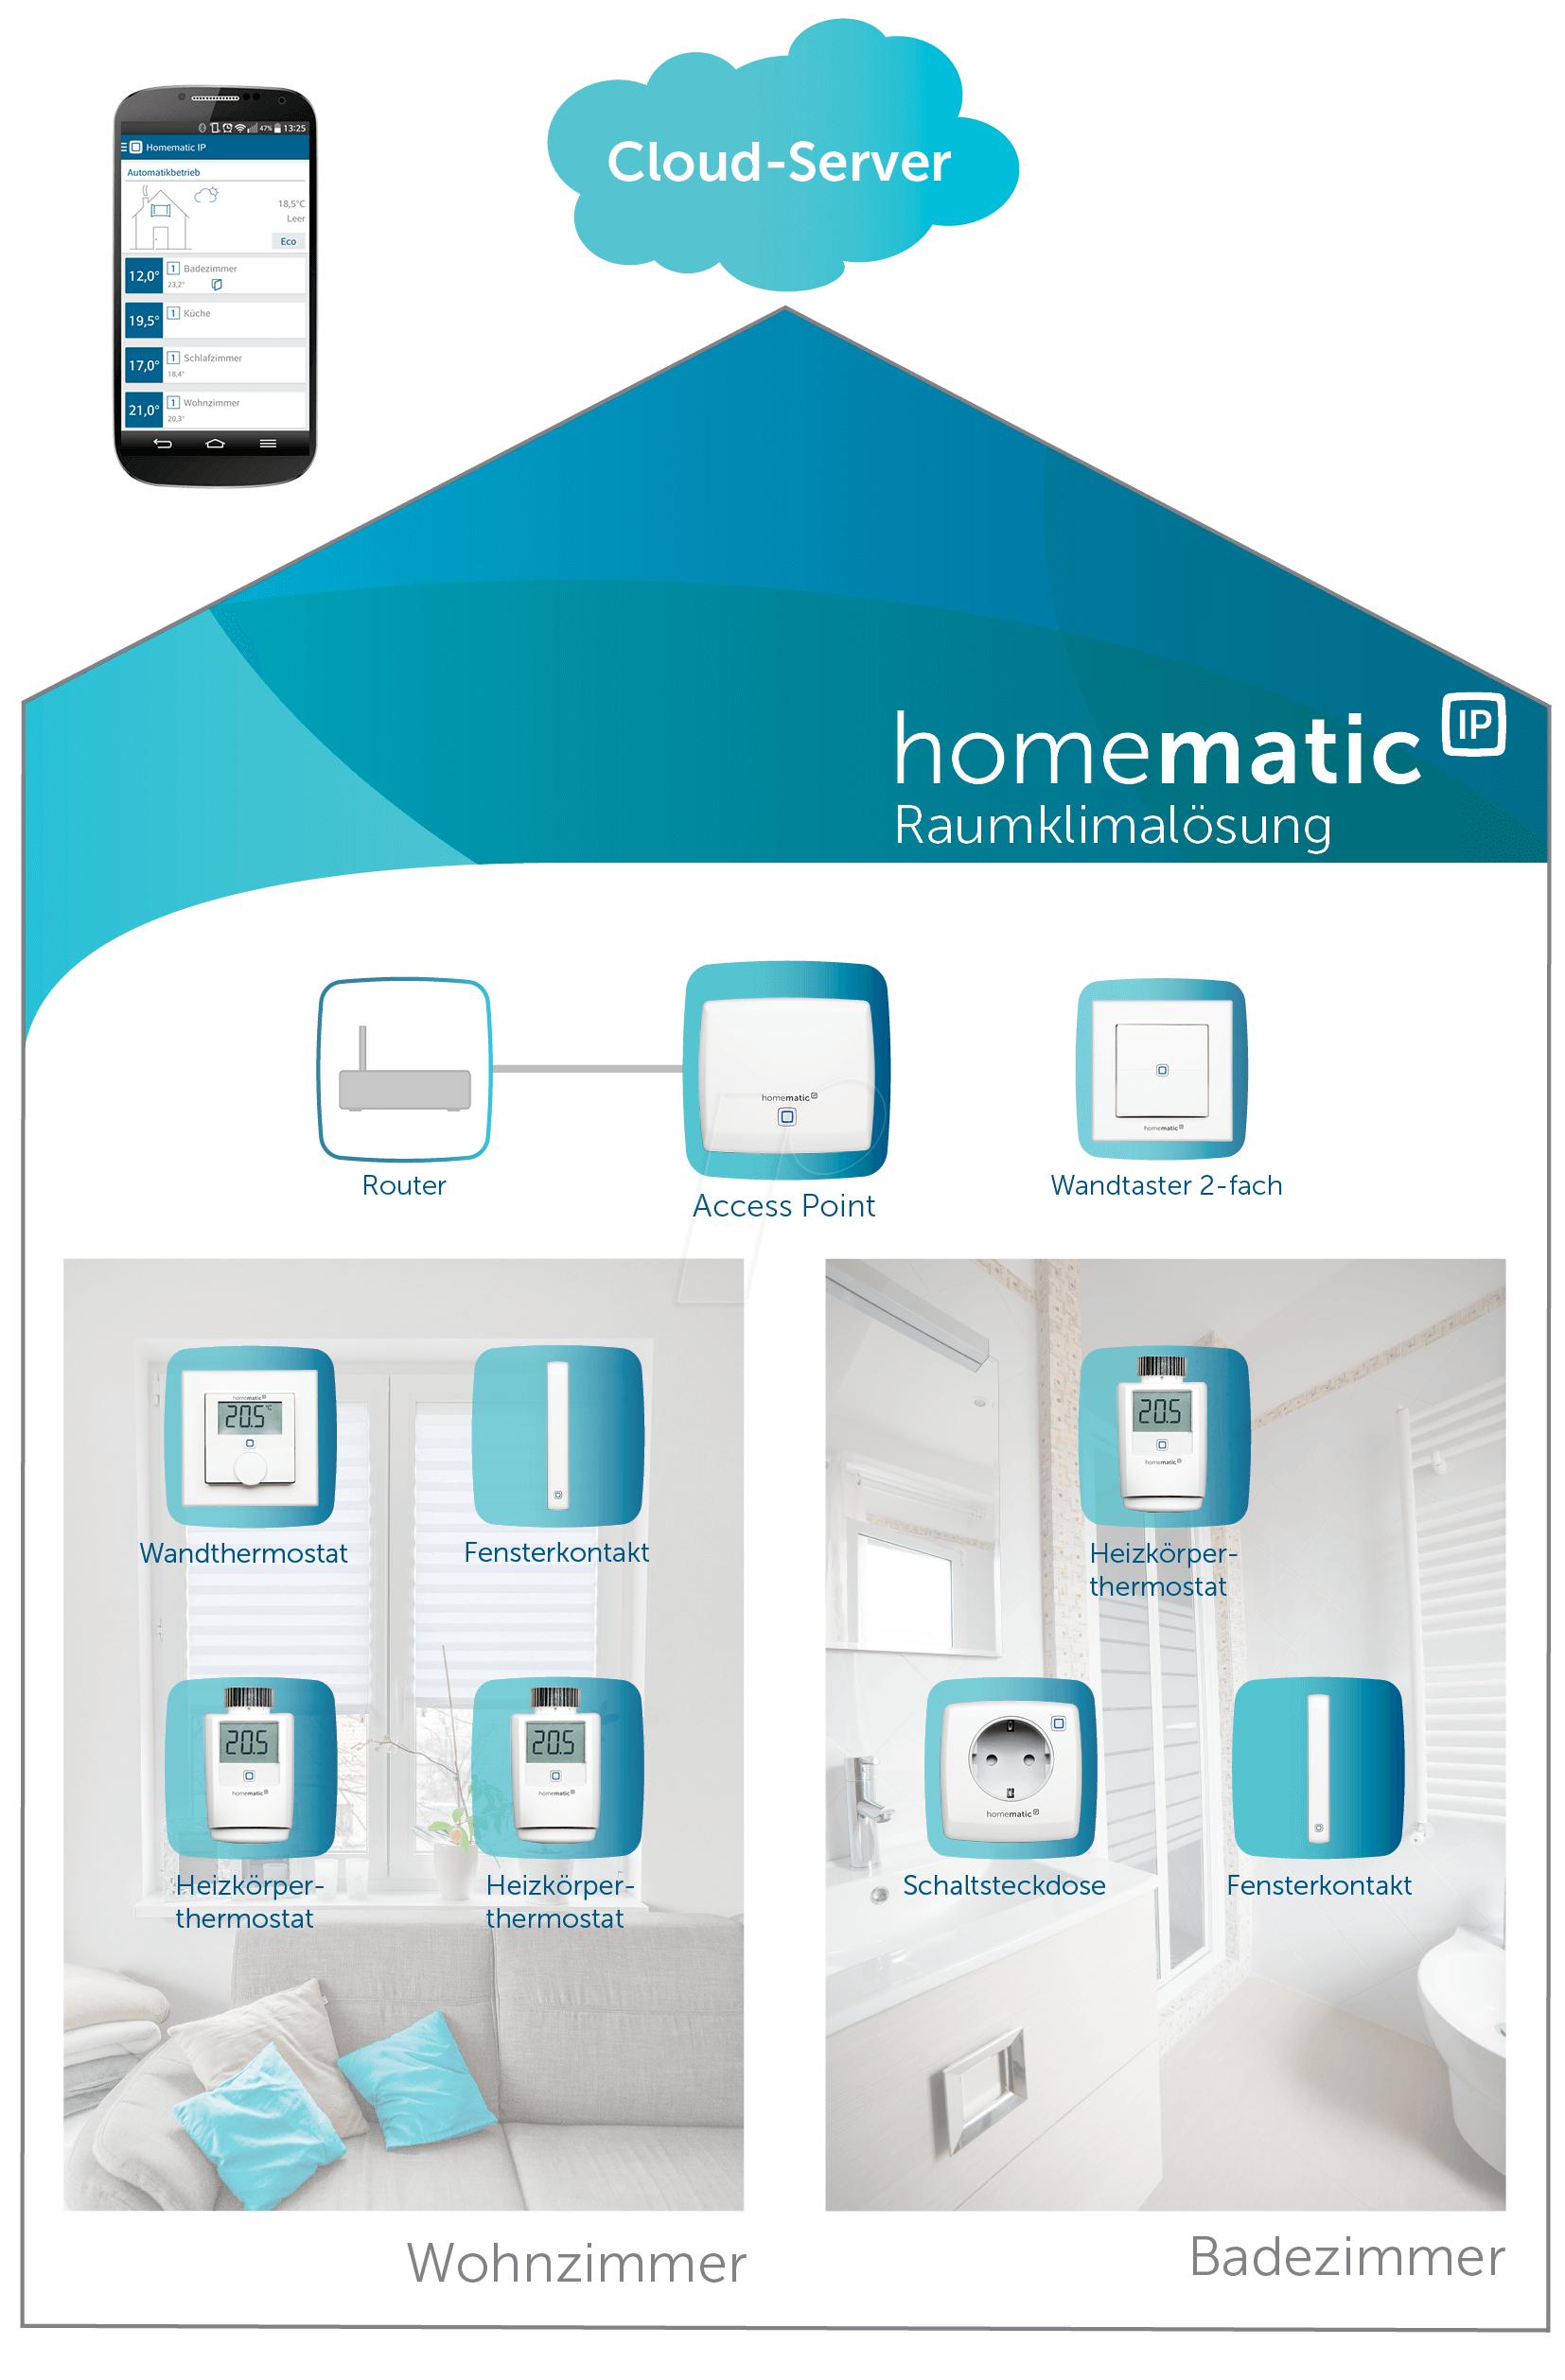 Homematic Ip Access Point : hmip hap homematic ip access point at reichelt elektronik ~ Yasmunasinghe.com Haus und Dekorationen